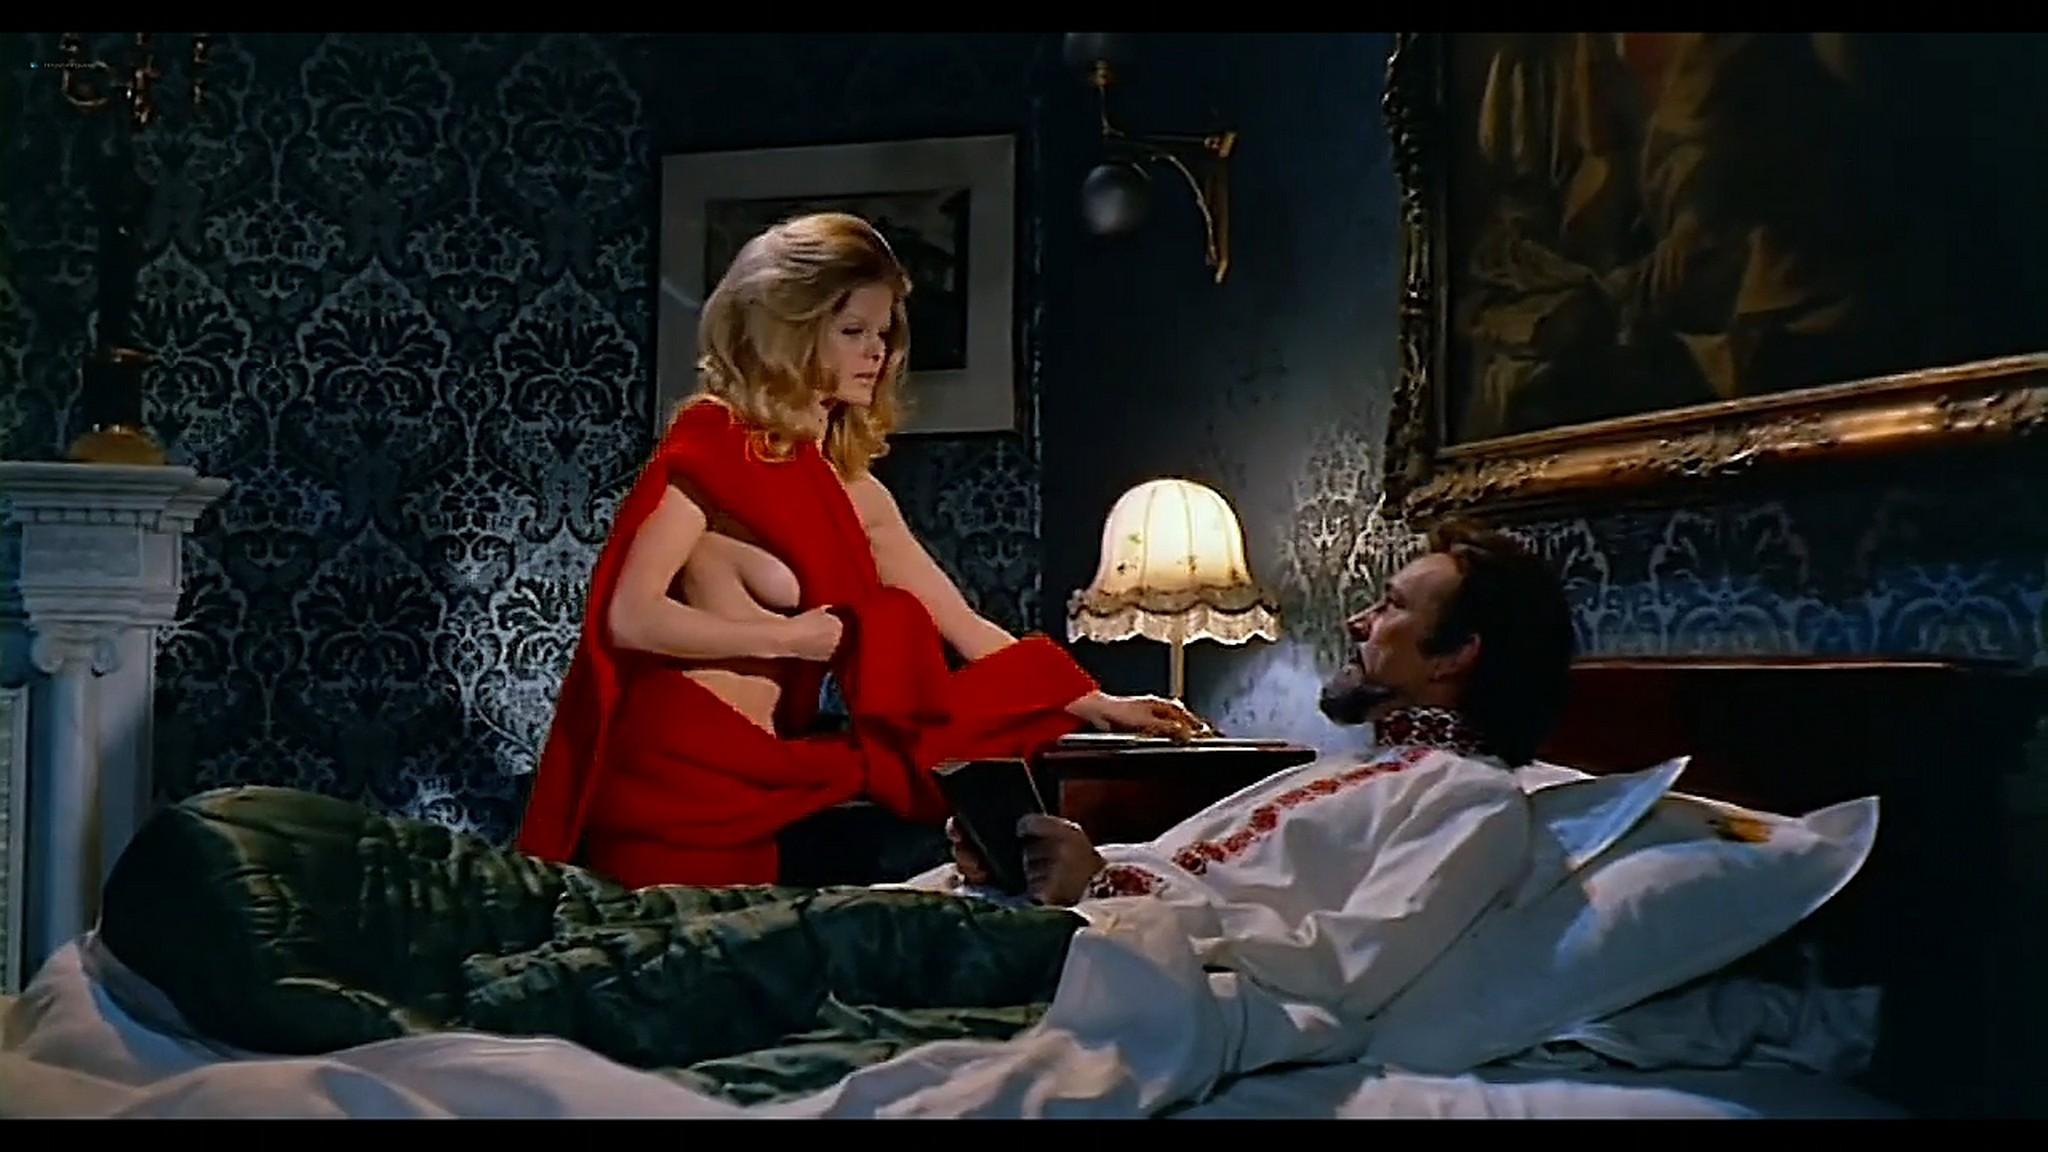 Joey Heatherton nude topless Sybil Danning Karin Schubert and others nude Bluebeard 1972 720p 13